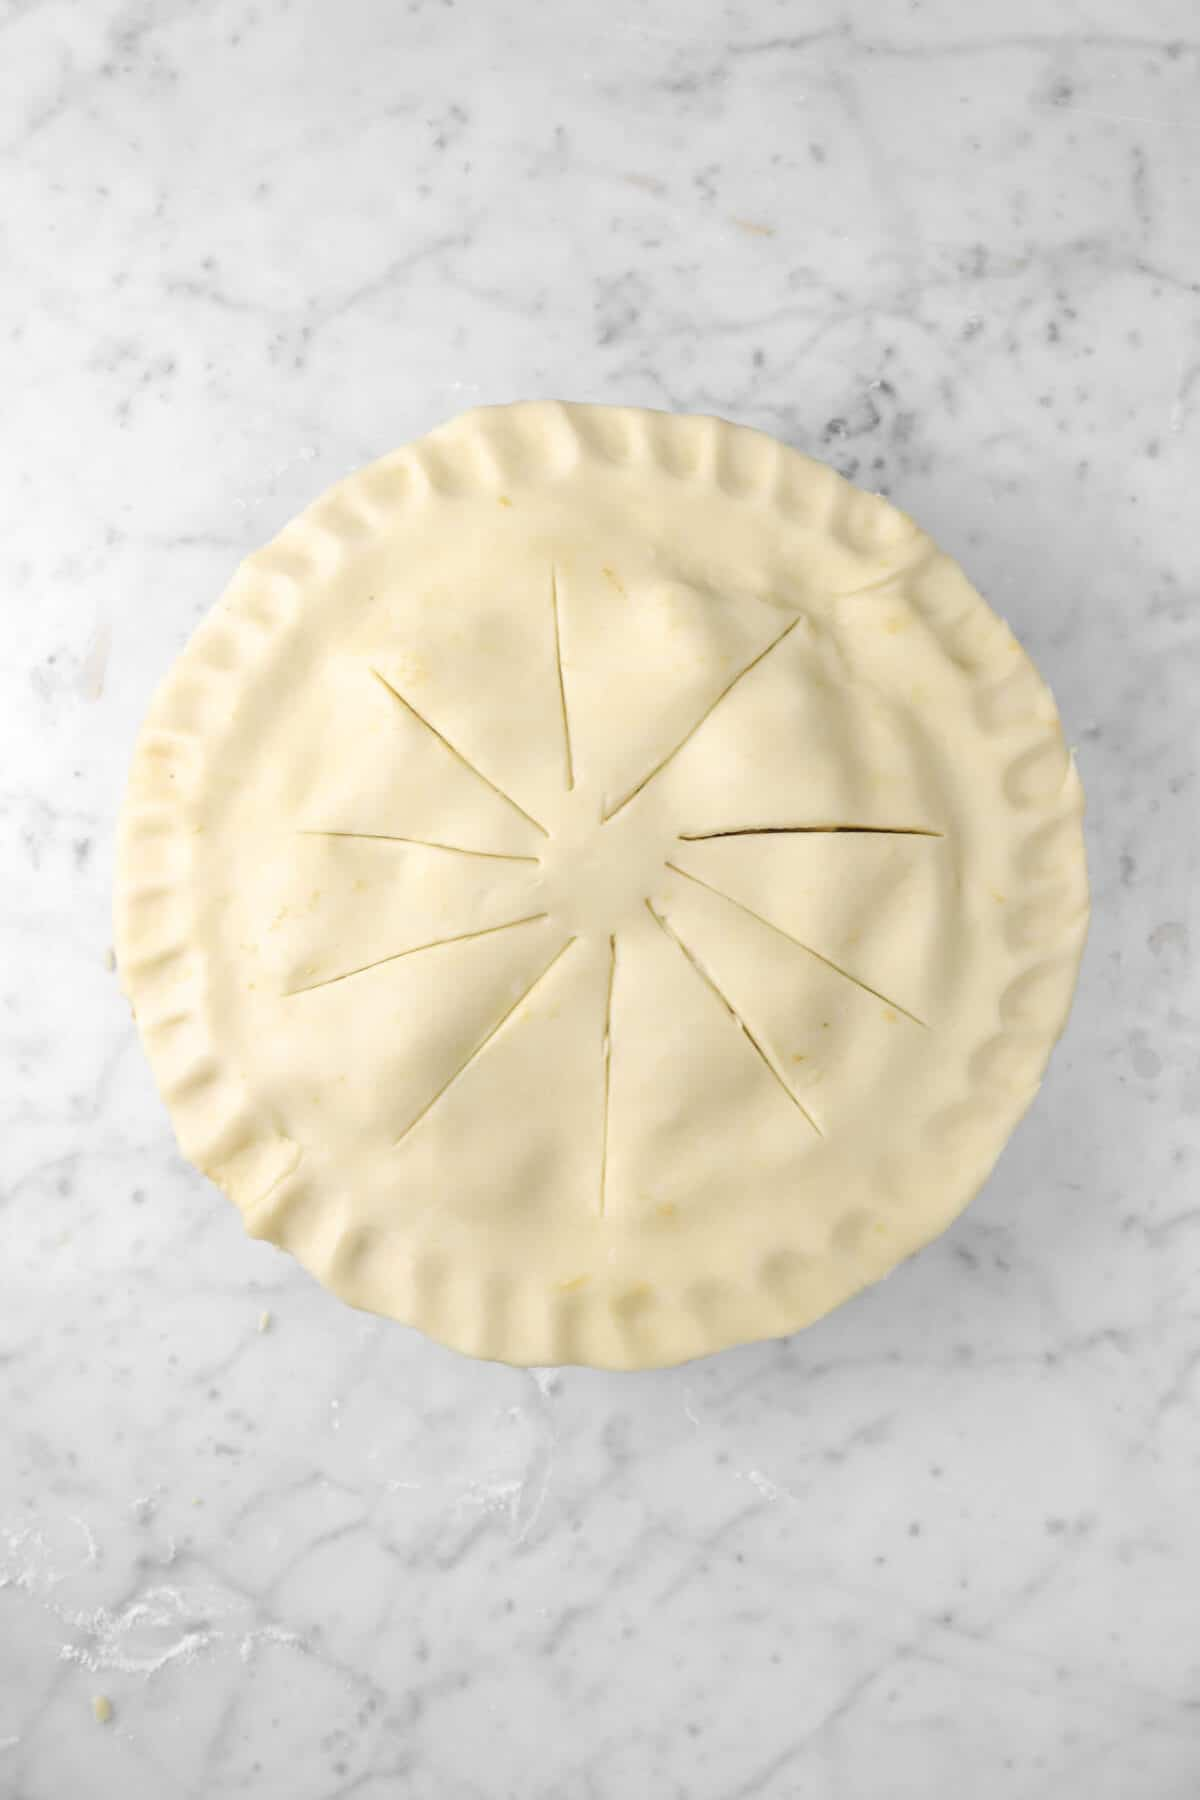 pie dough cut and pressed